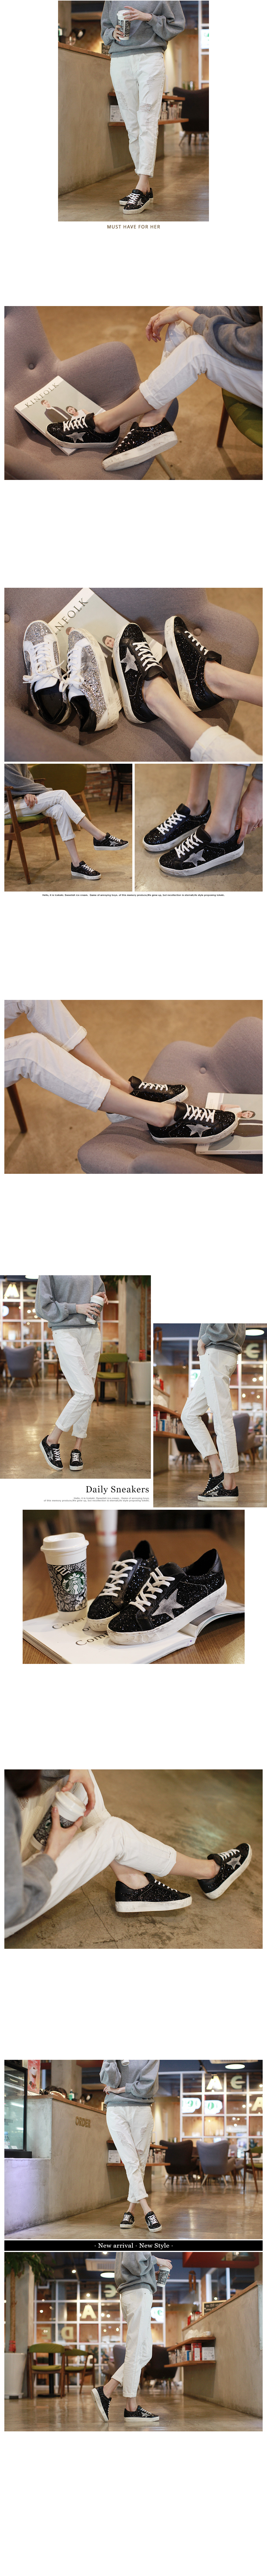 Leness sneakers 3cm